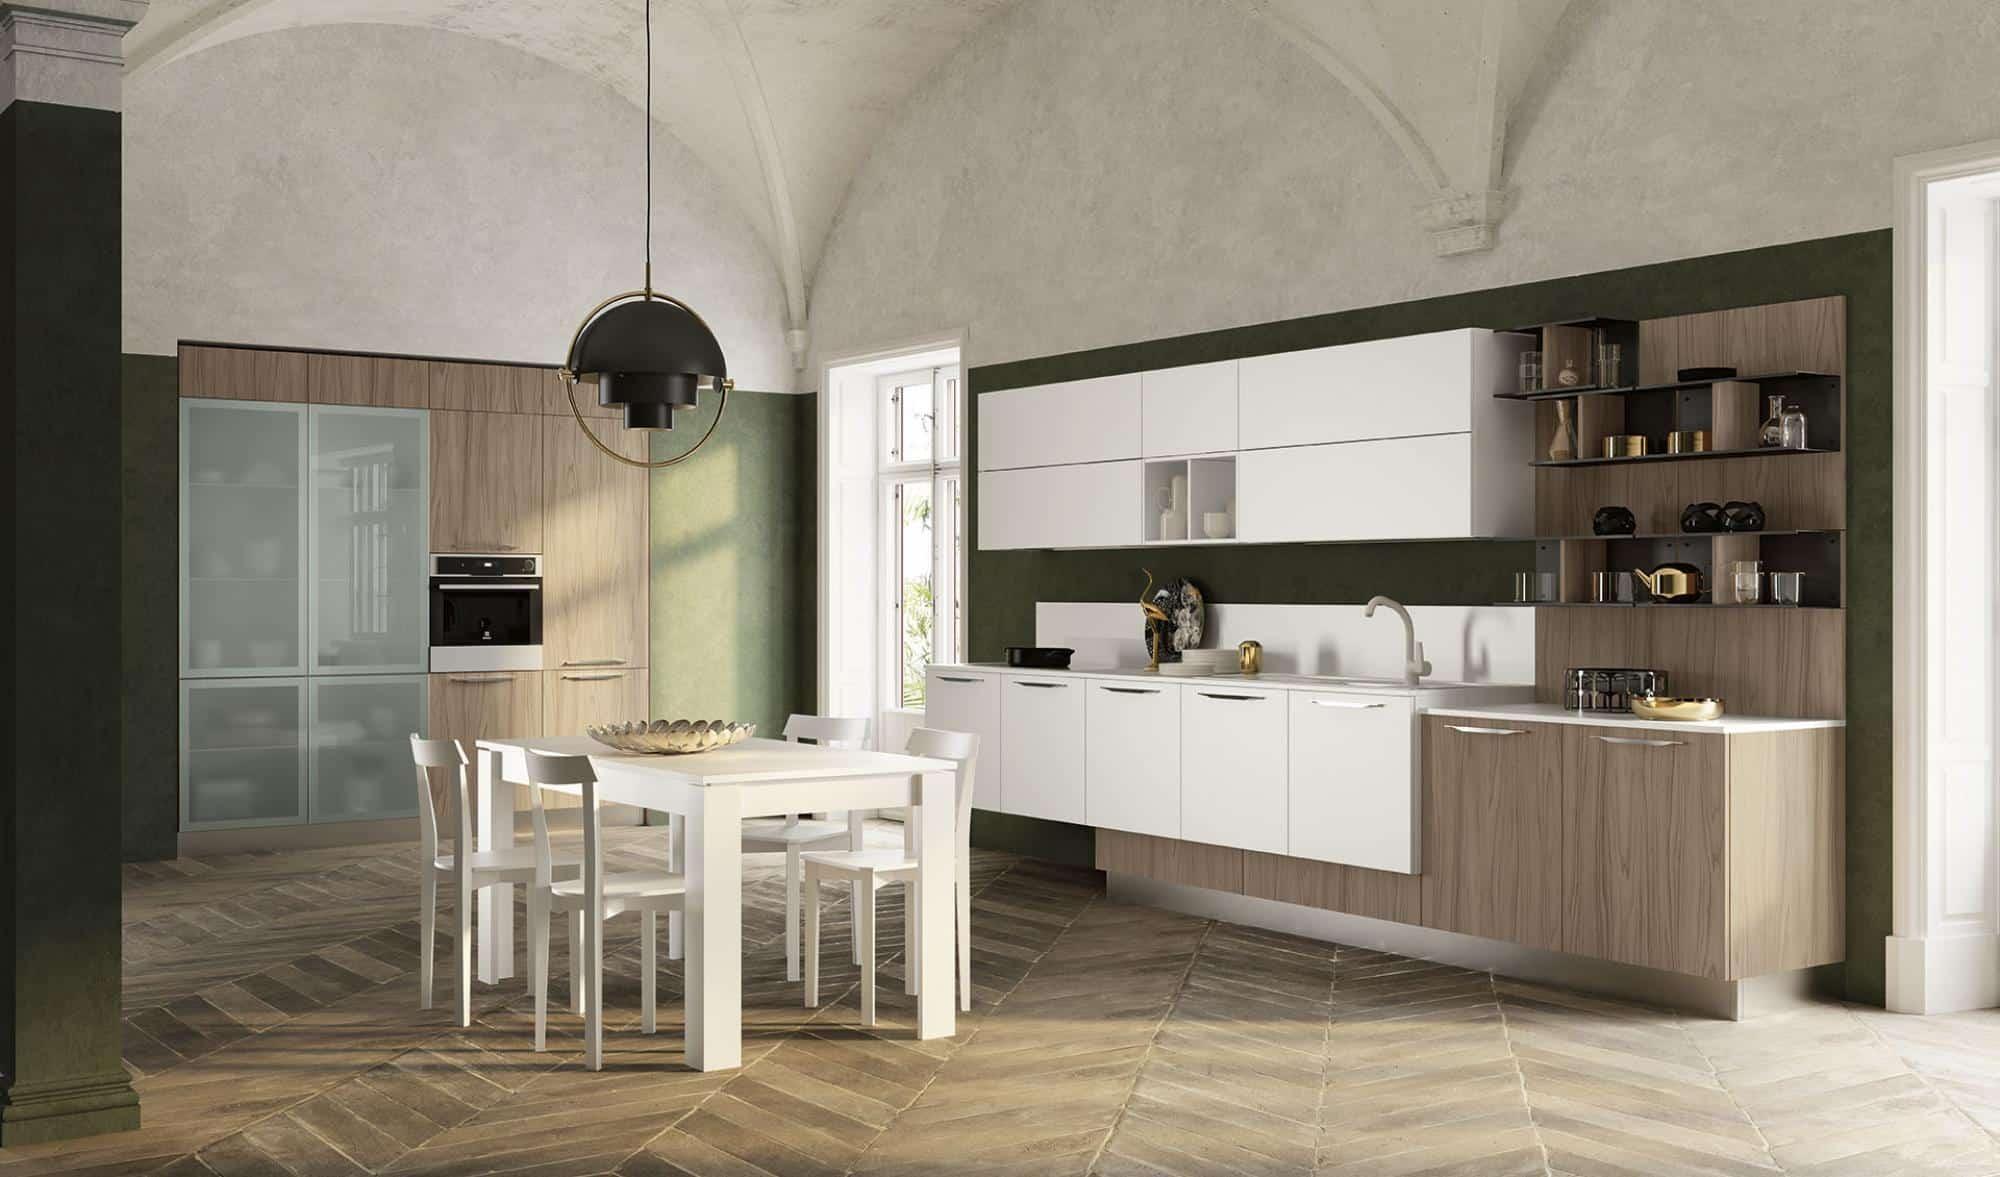 Lungomare κουζινα χωρις πομολο με υφη φυσικου ξυλου και λευκη ματ λακα